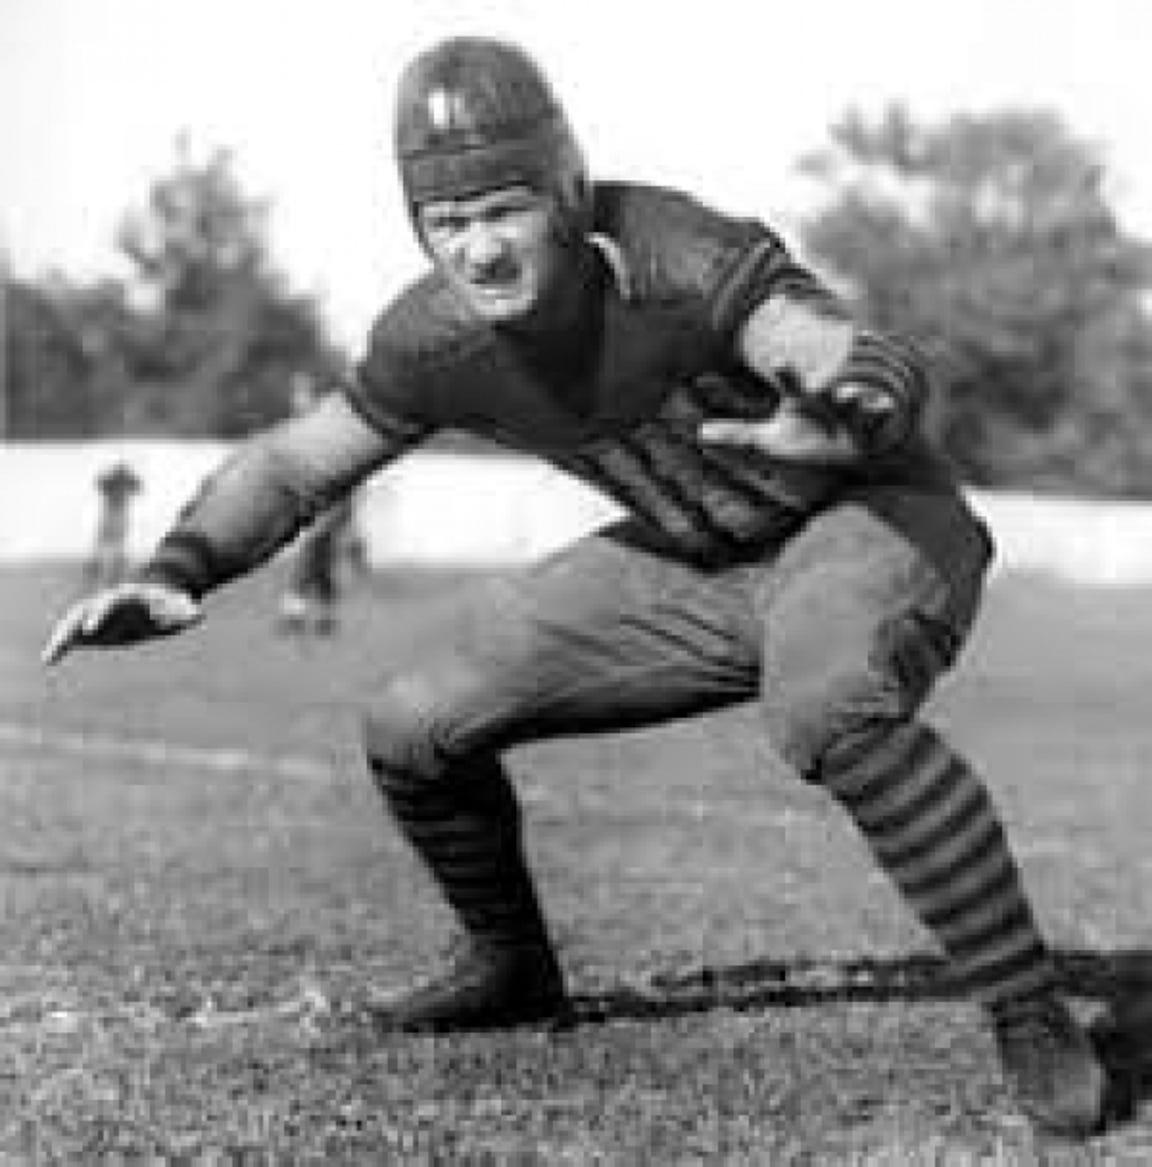 Elmer Sleight was an All-American lineman on Purdue's 1929 Big Ten championship team.